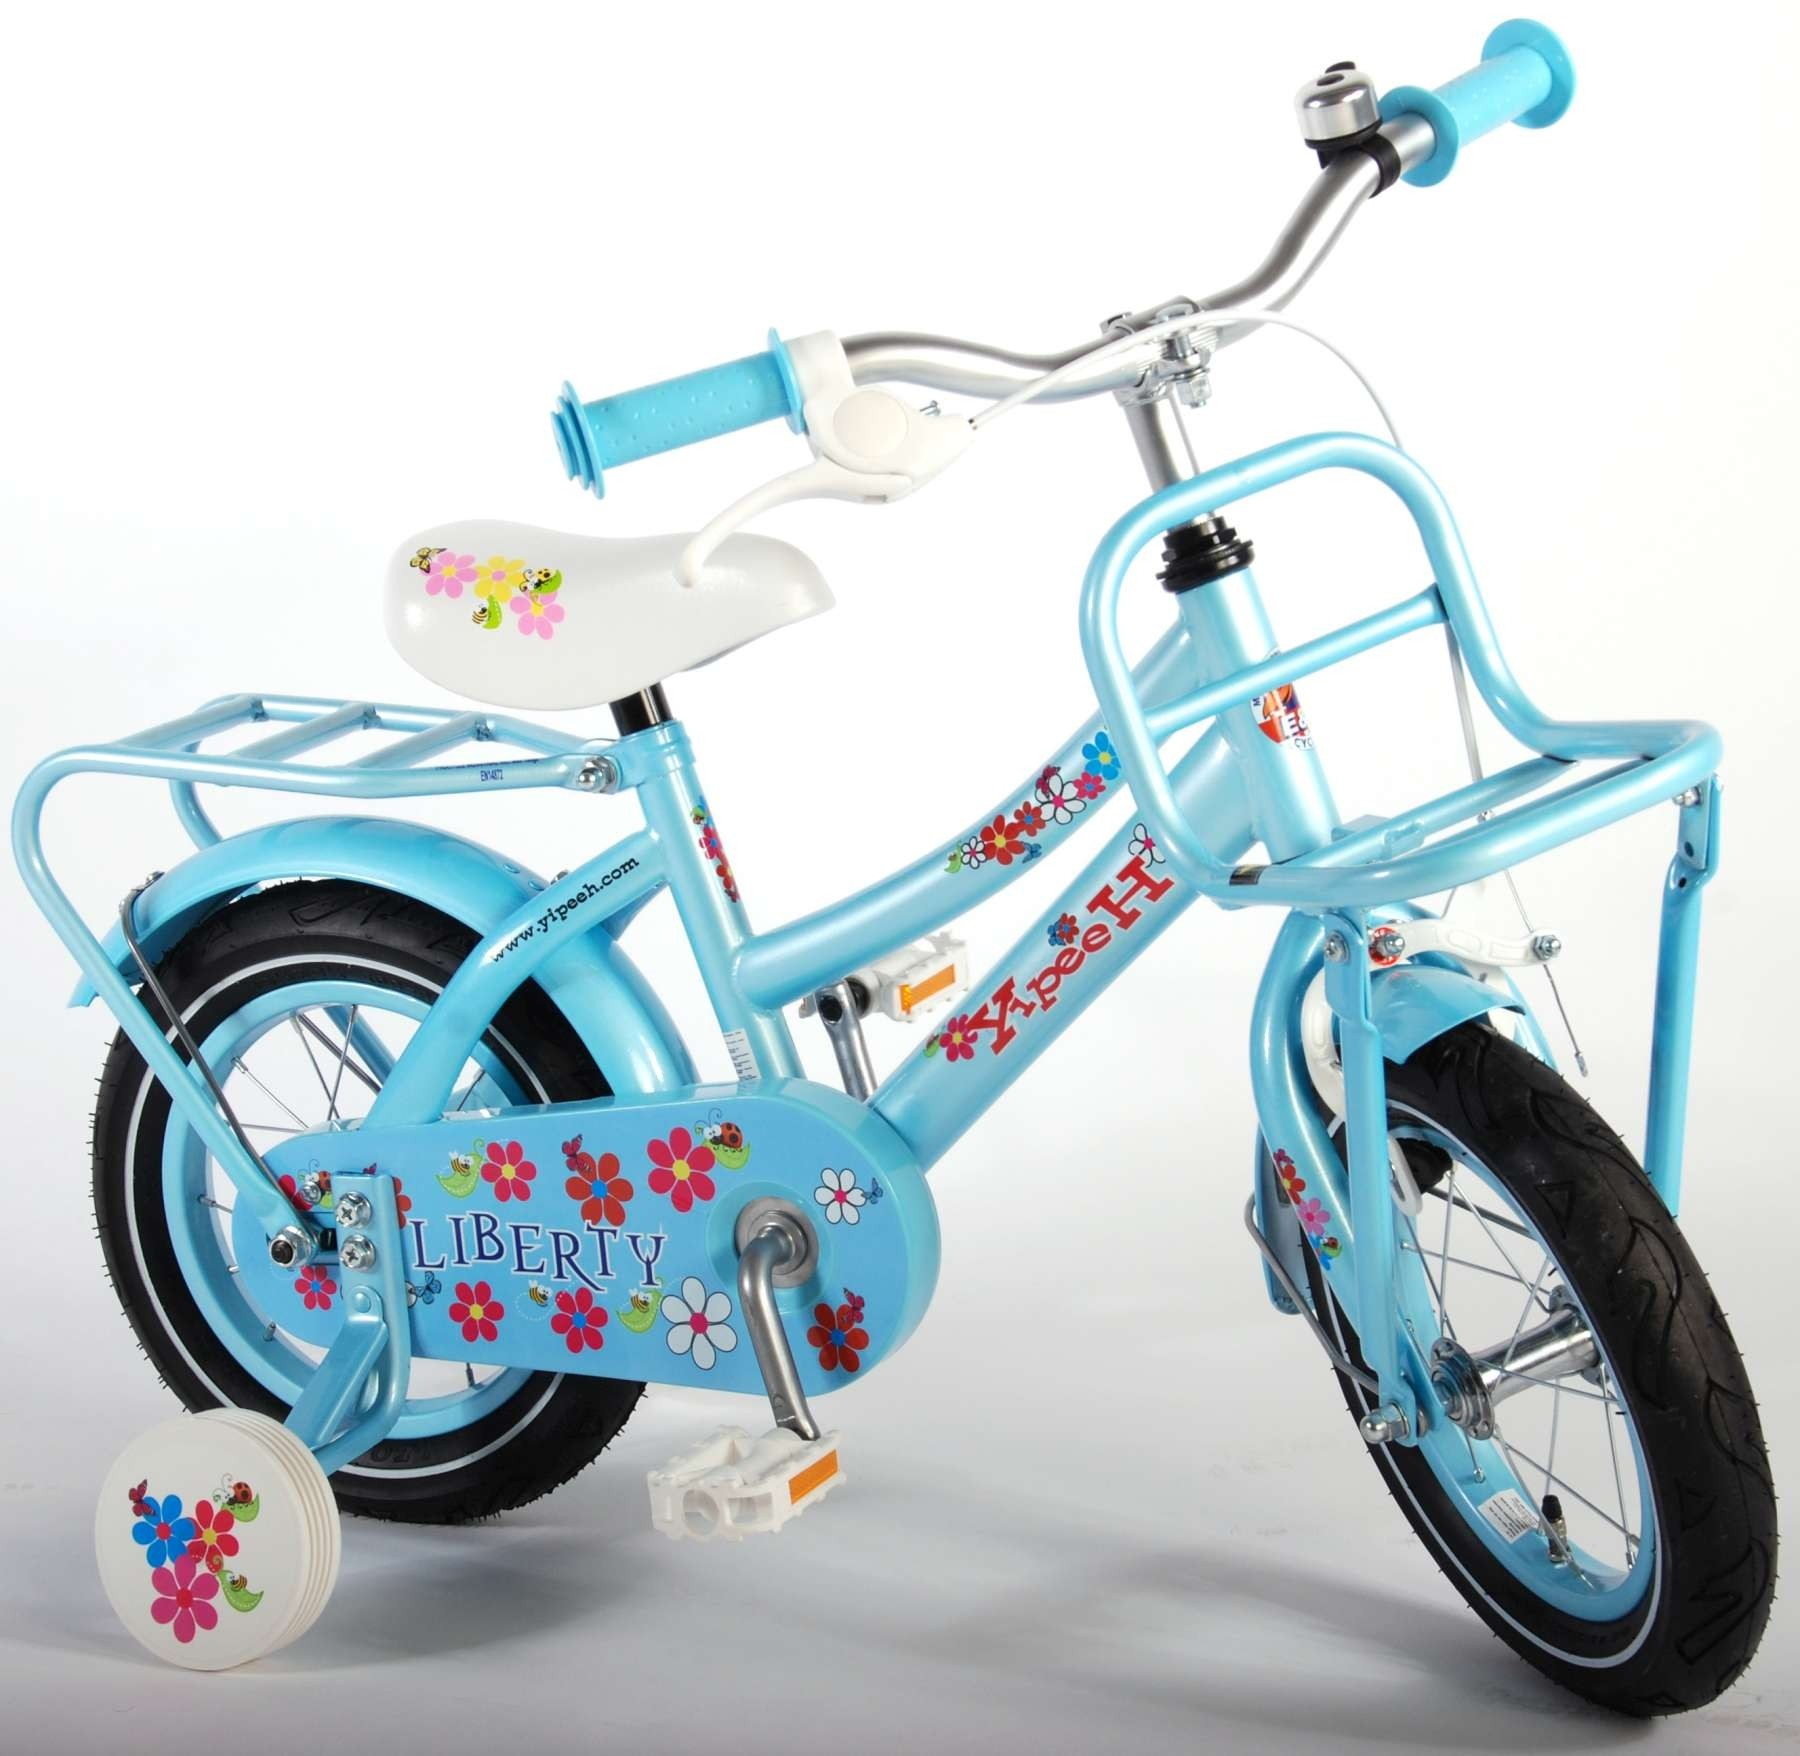 Yipeeh Liberty Urban Blauw 12 inch meisjesfiets 61208